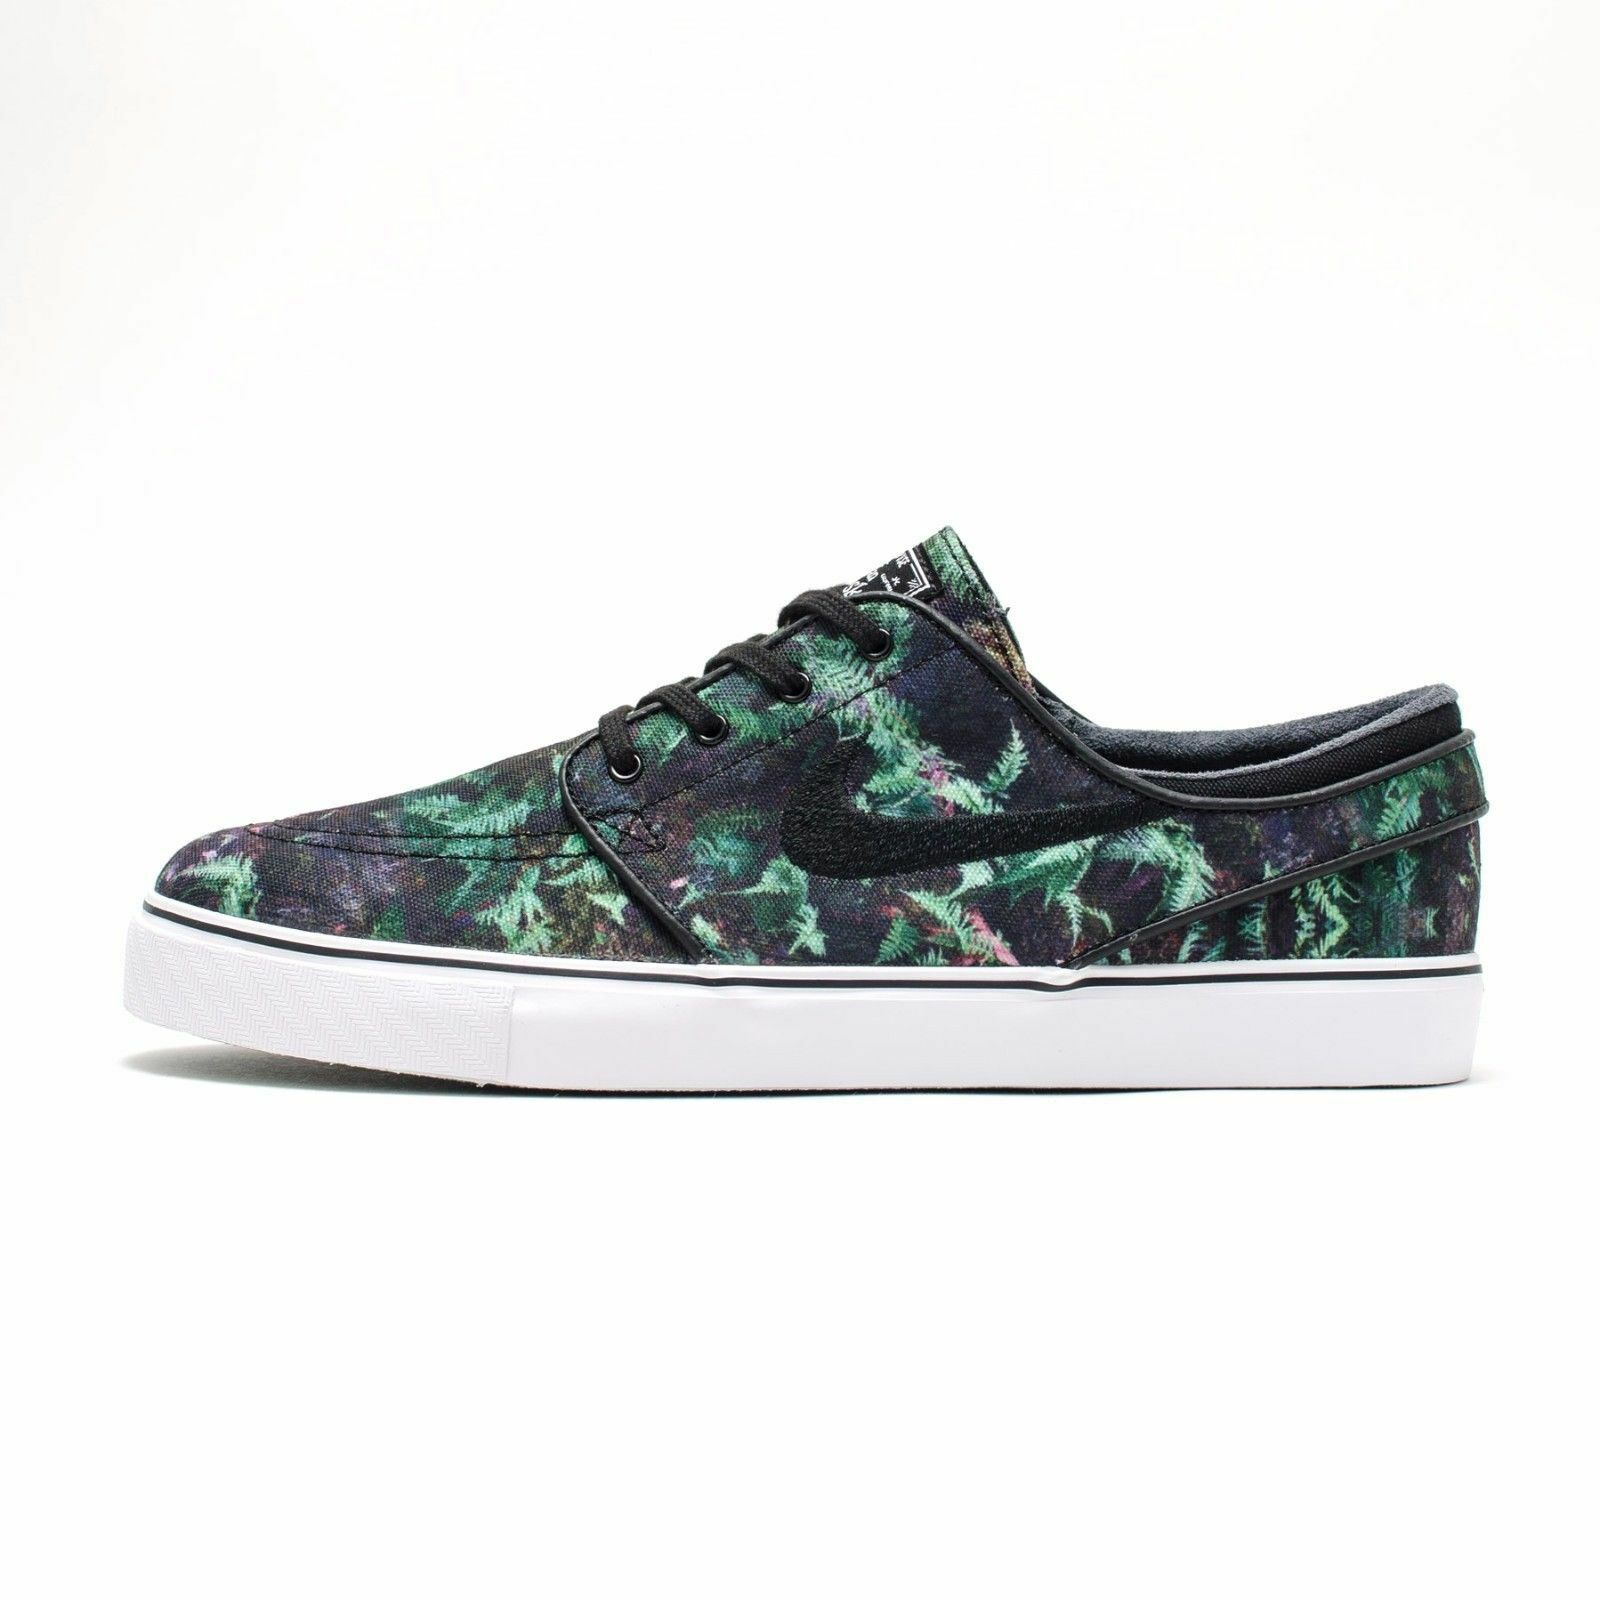 Nike - Janoski CNVS PRM   705190 301   36,5   Palm Leaves   Sneaker